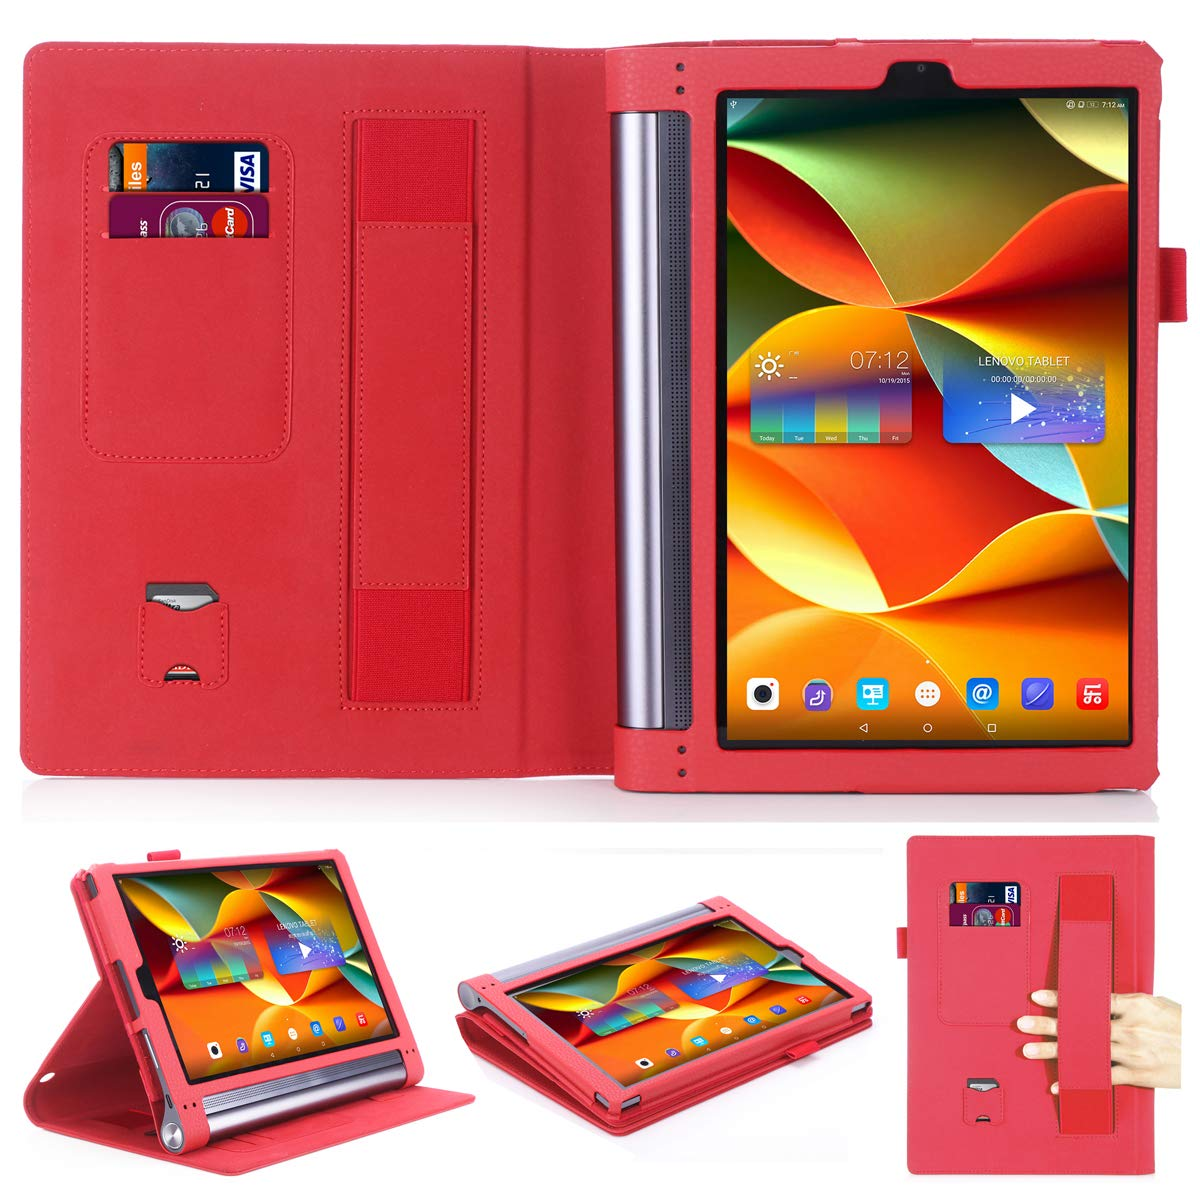 Lenovo Yoga Tab 3 Plus/Lenovo Yoga Tab 3 Pro 10 X90F YT3-X703F 10.1 Case,Premium PU Leather Folio Cover for Lenovo Yoga Tab 3 Plus 10.1/Lenovo Yoga ...